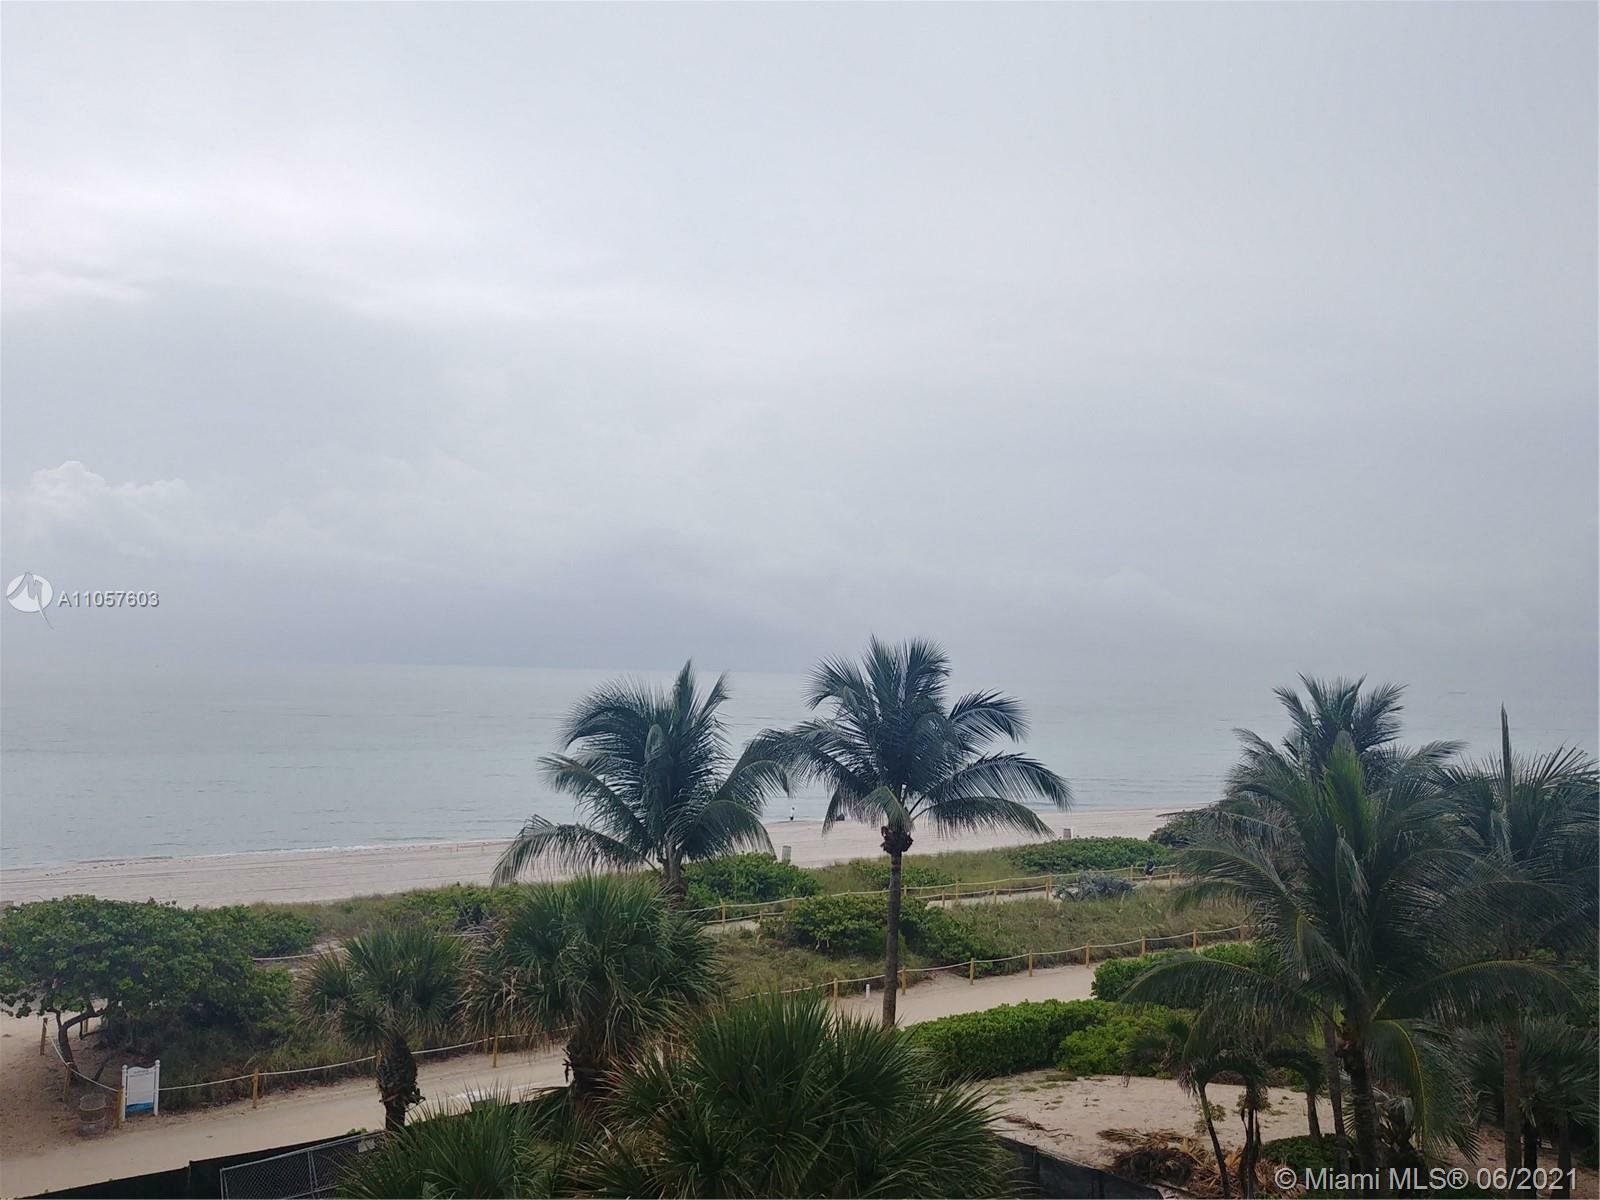 Condo in Bal Harbour, Florida, United States 1 - 11518305